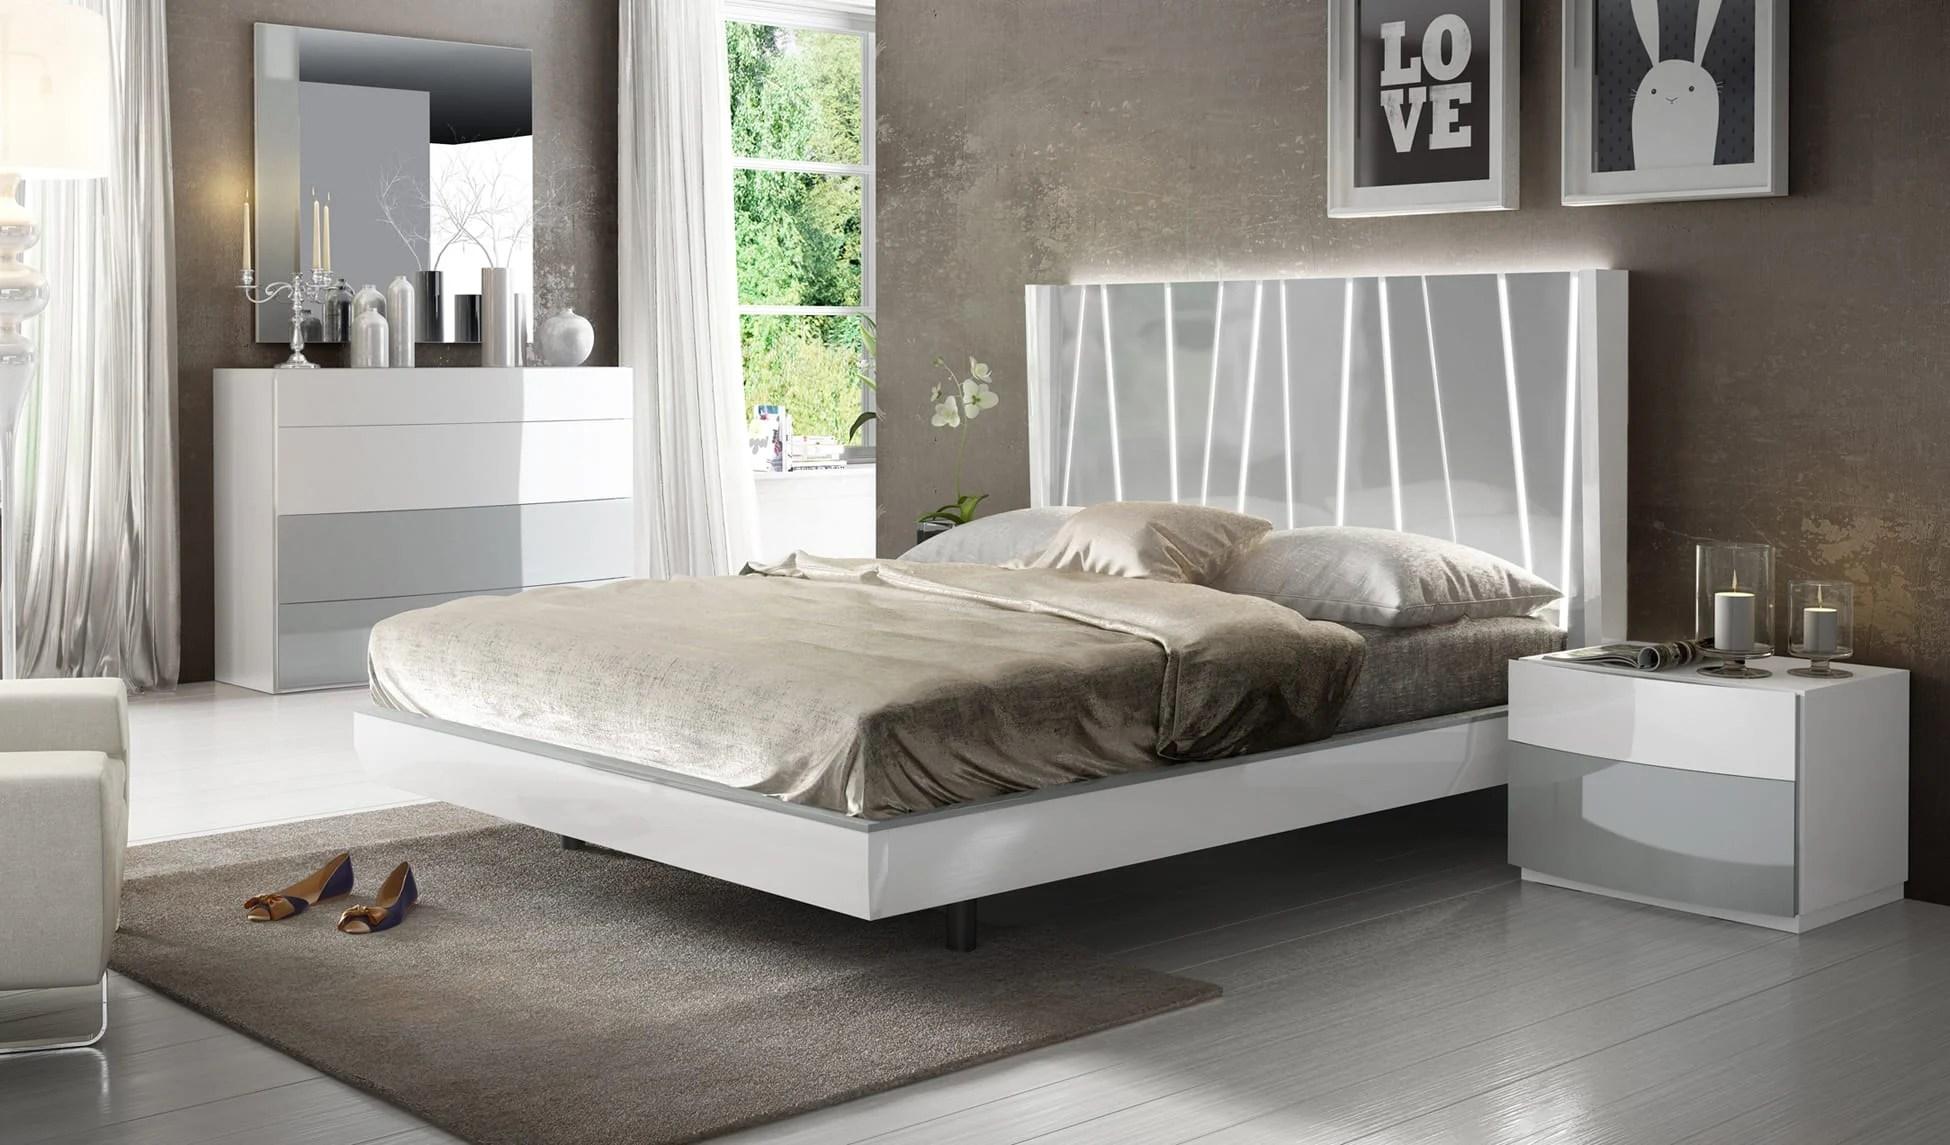 ronda dali white gray bedroom set by esf